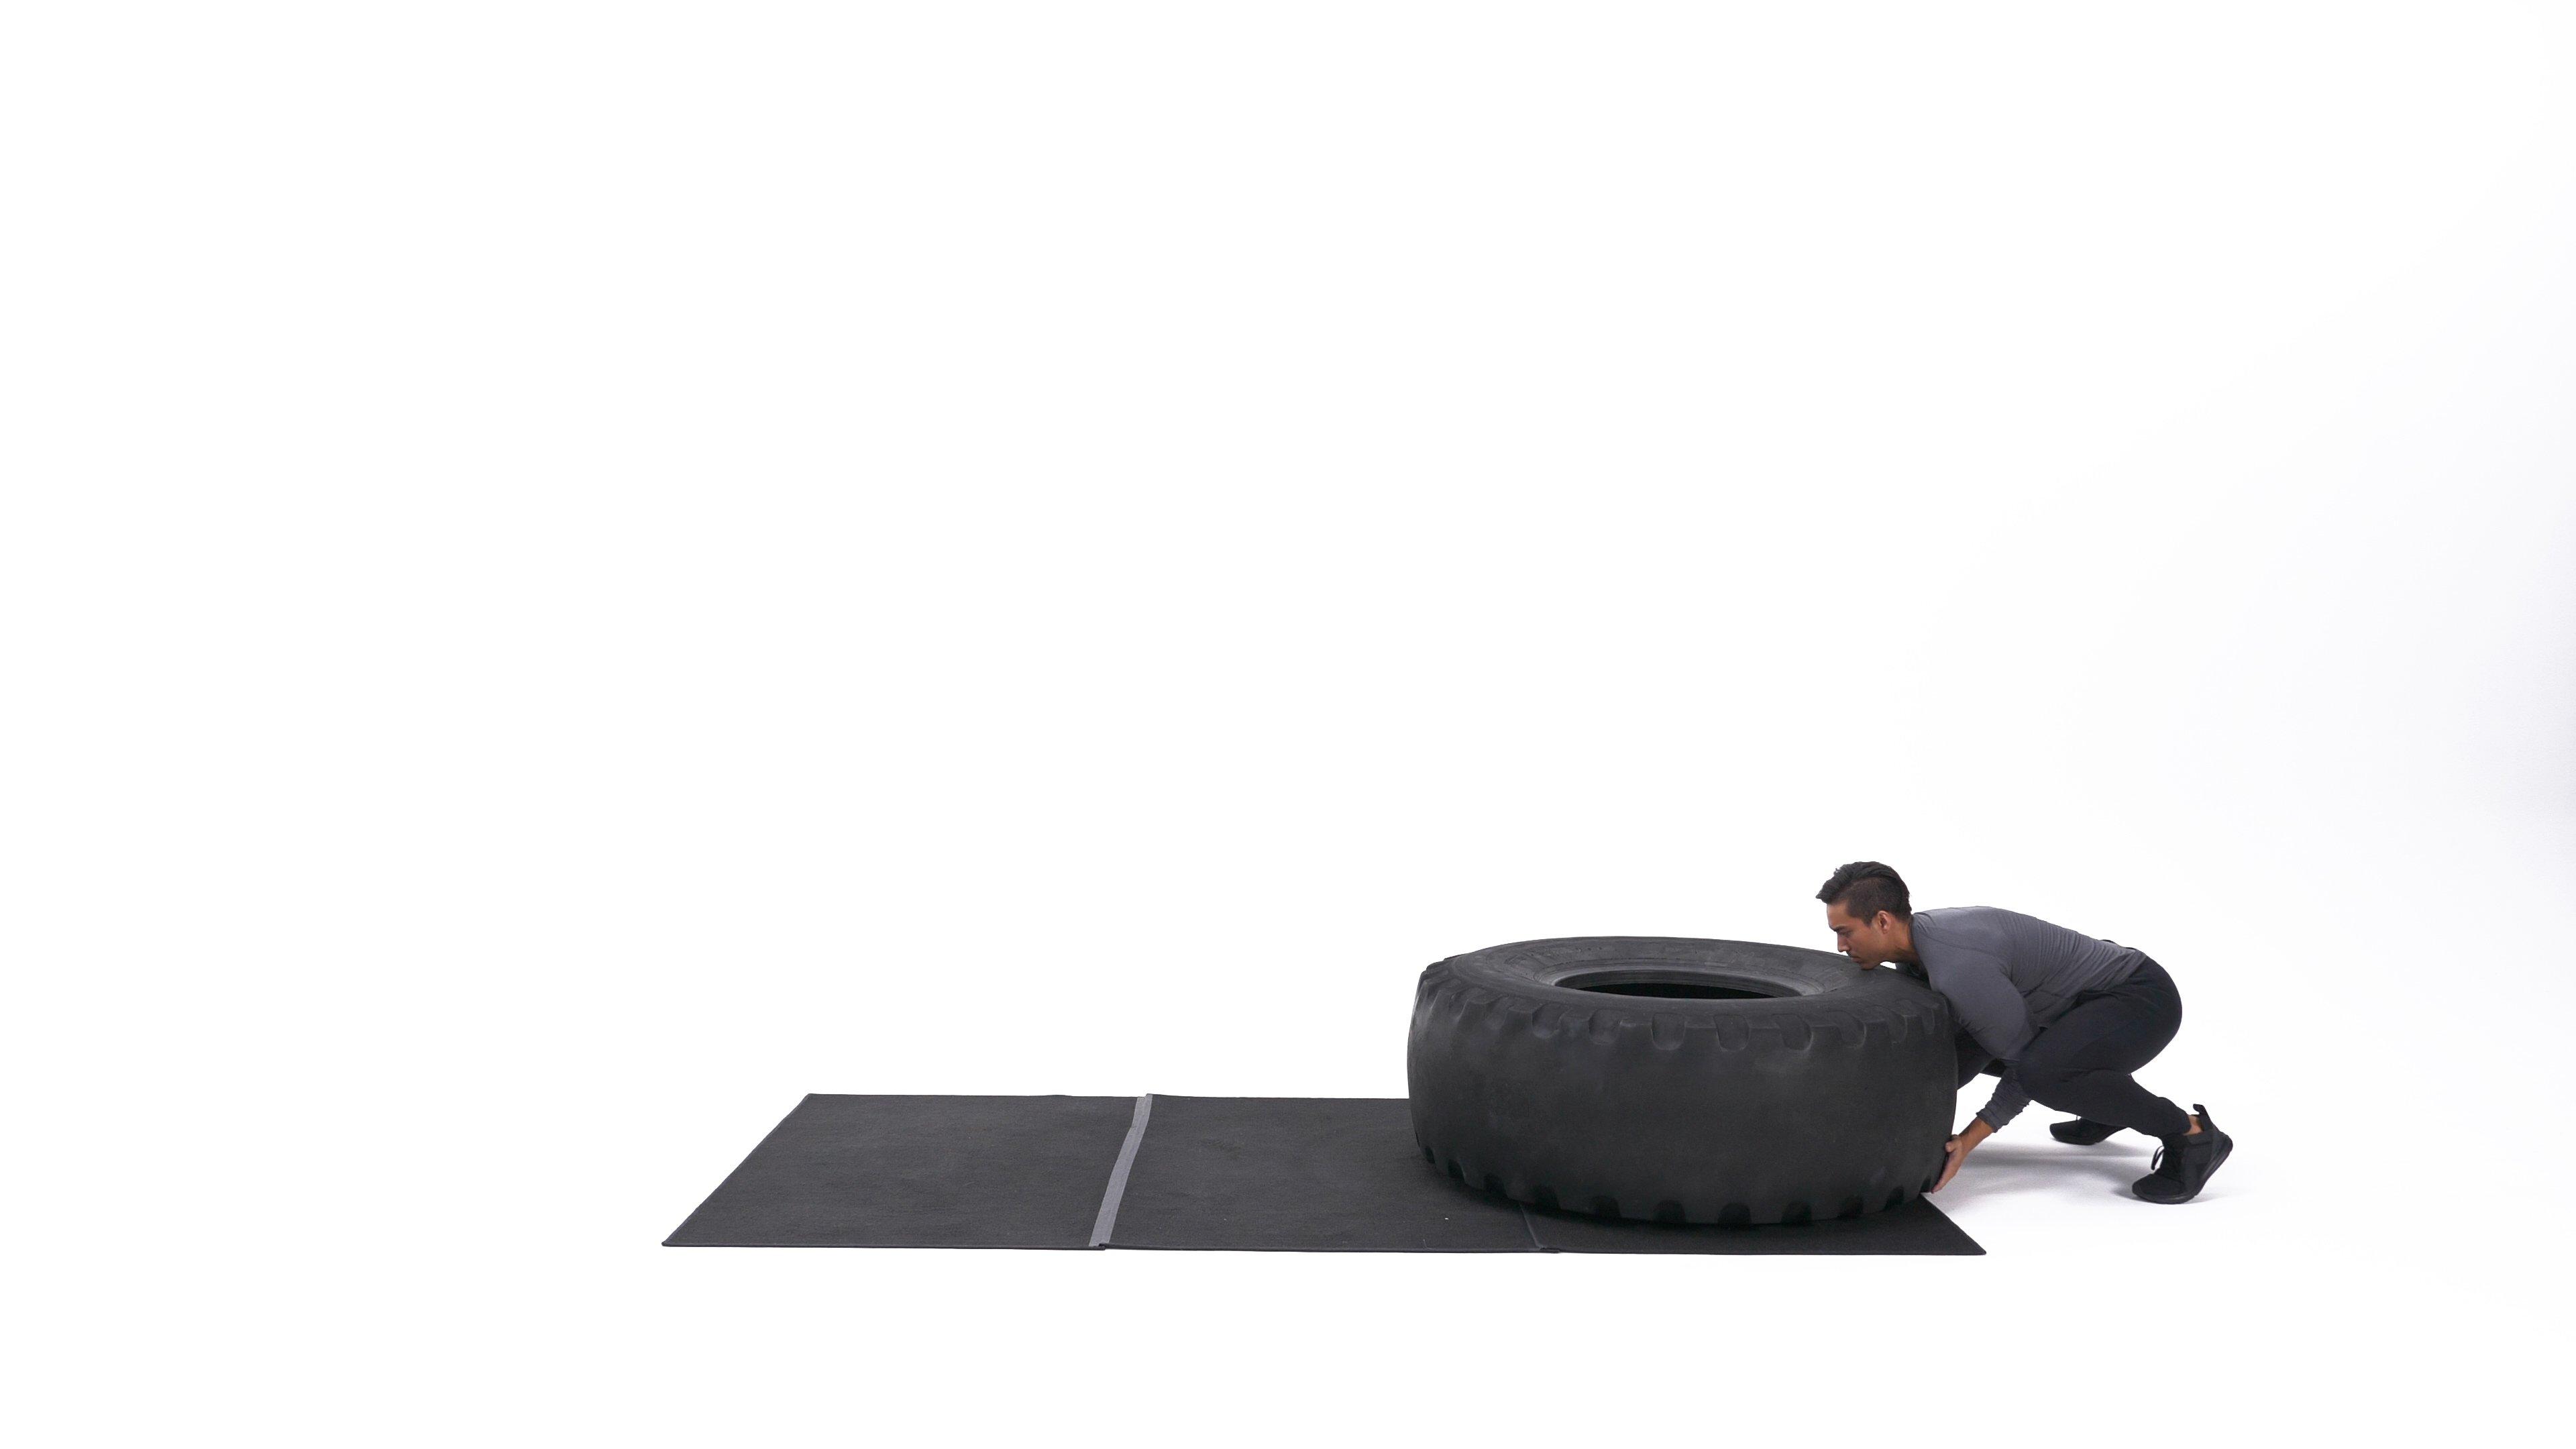 Tire flip image